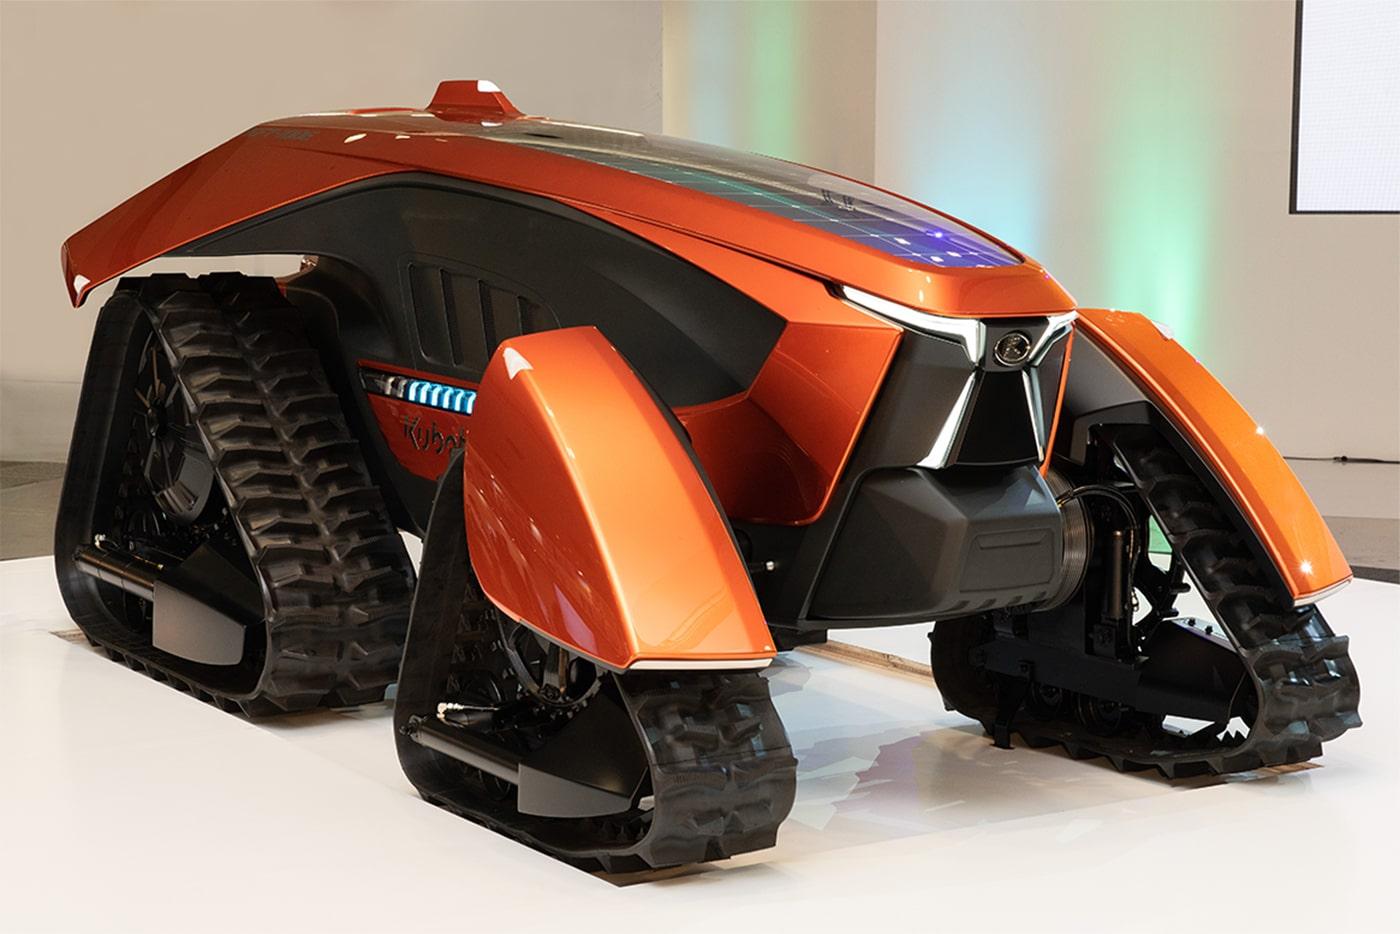 Kubota presents an autonomous, electric concept tractor with AI